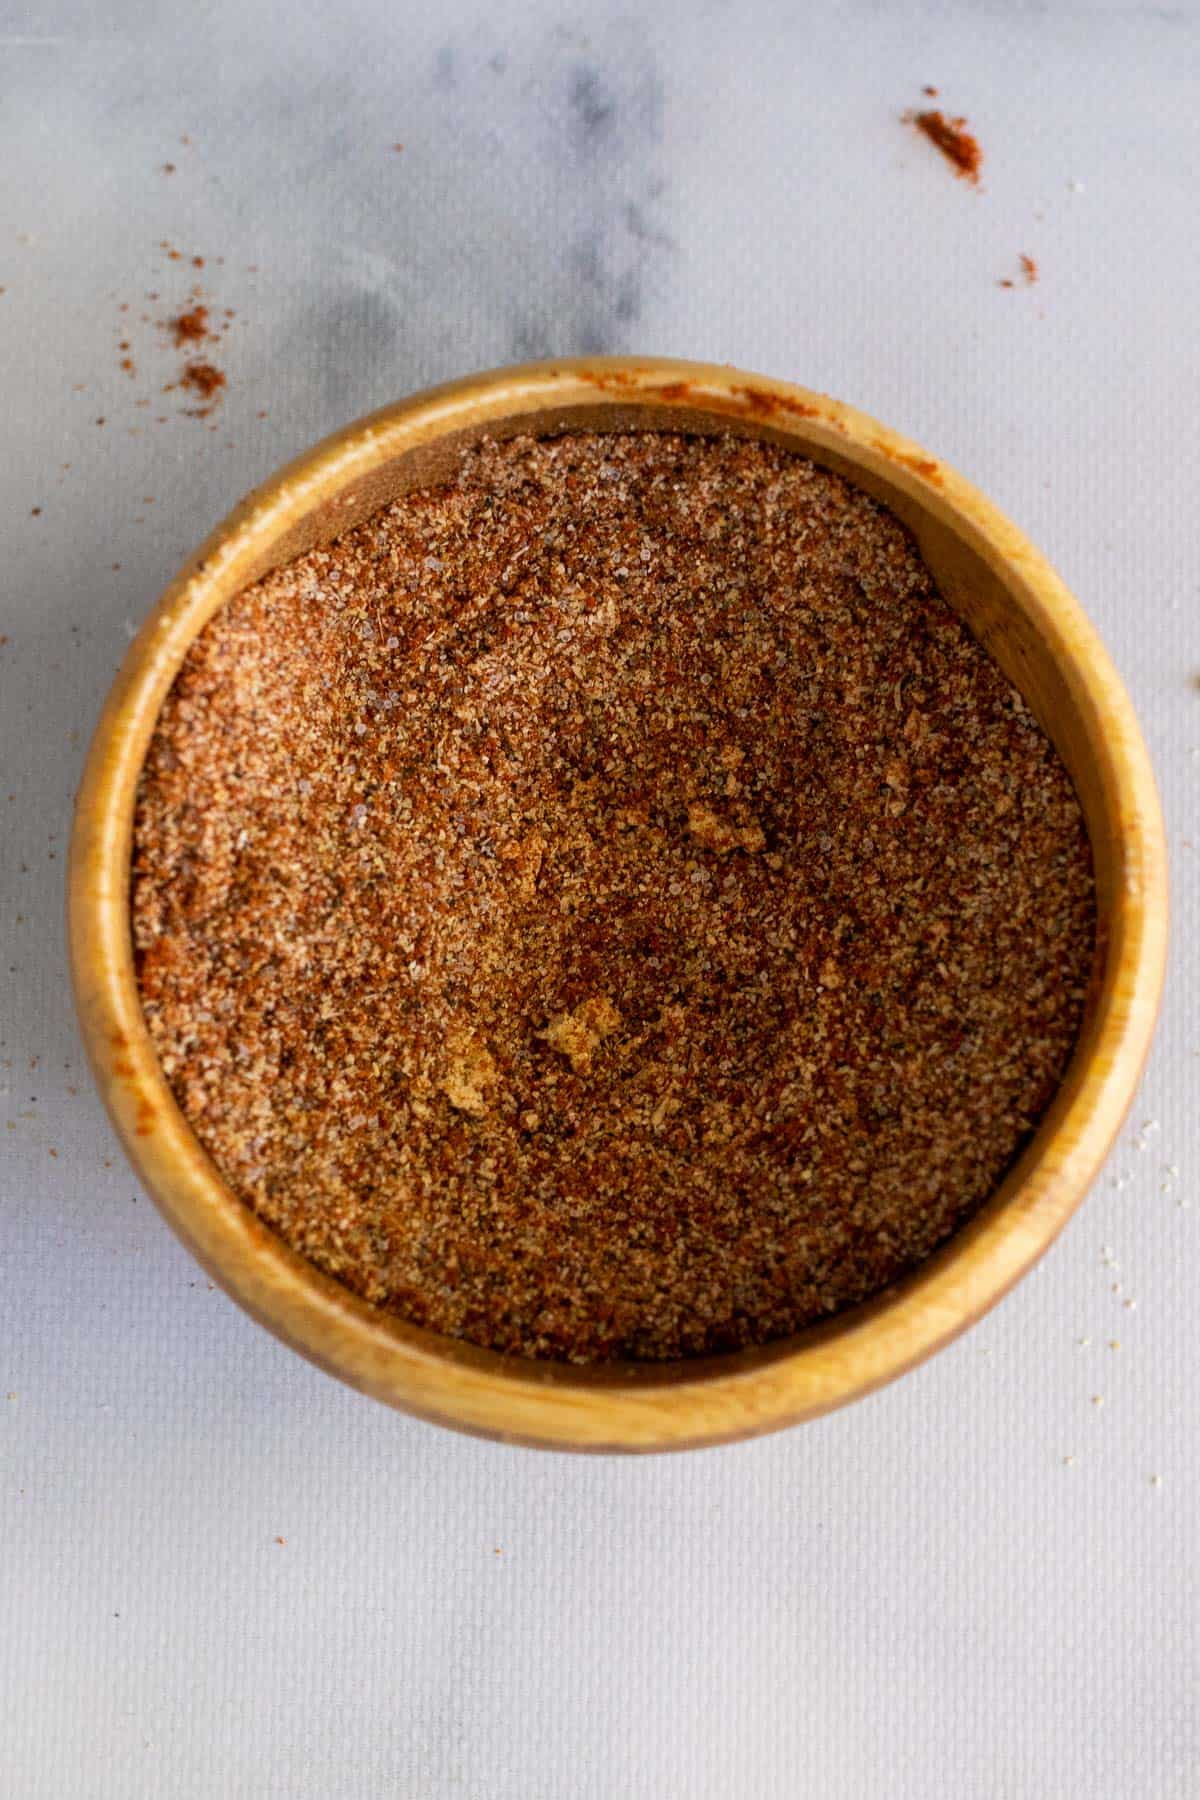 Seasoning mixture in a small ramekin, as seen from above